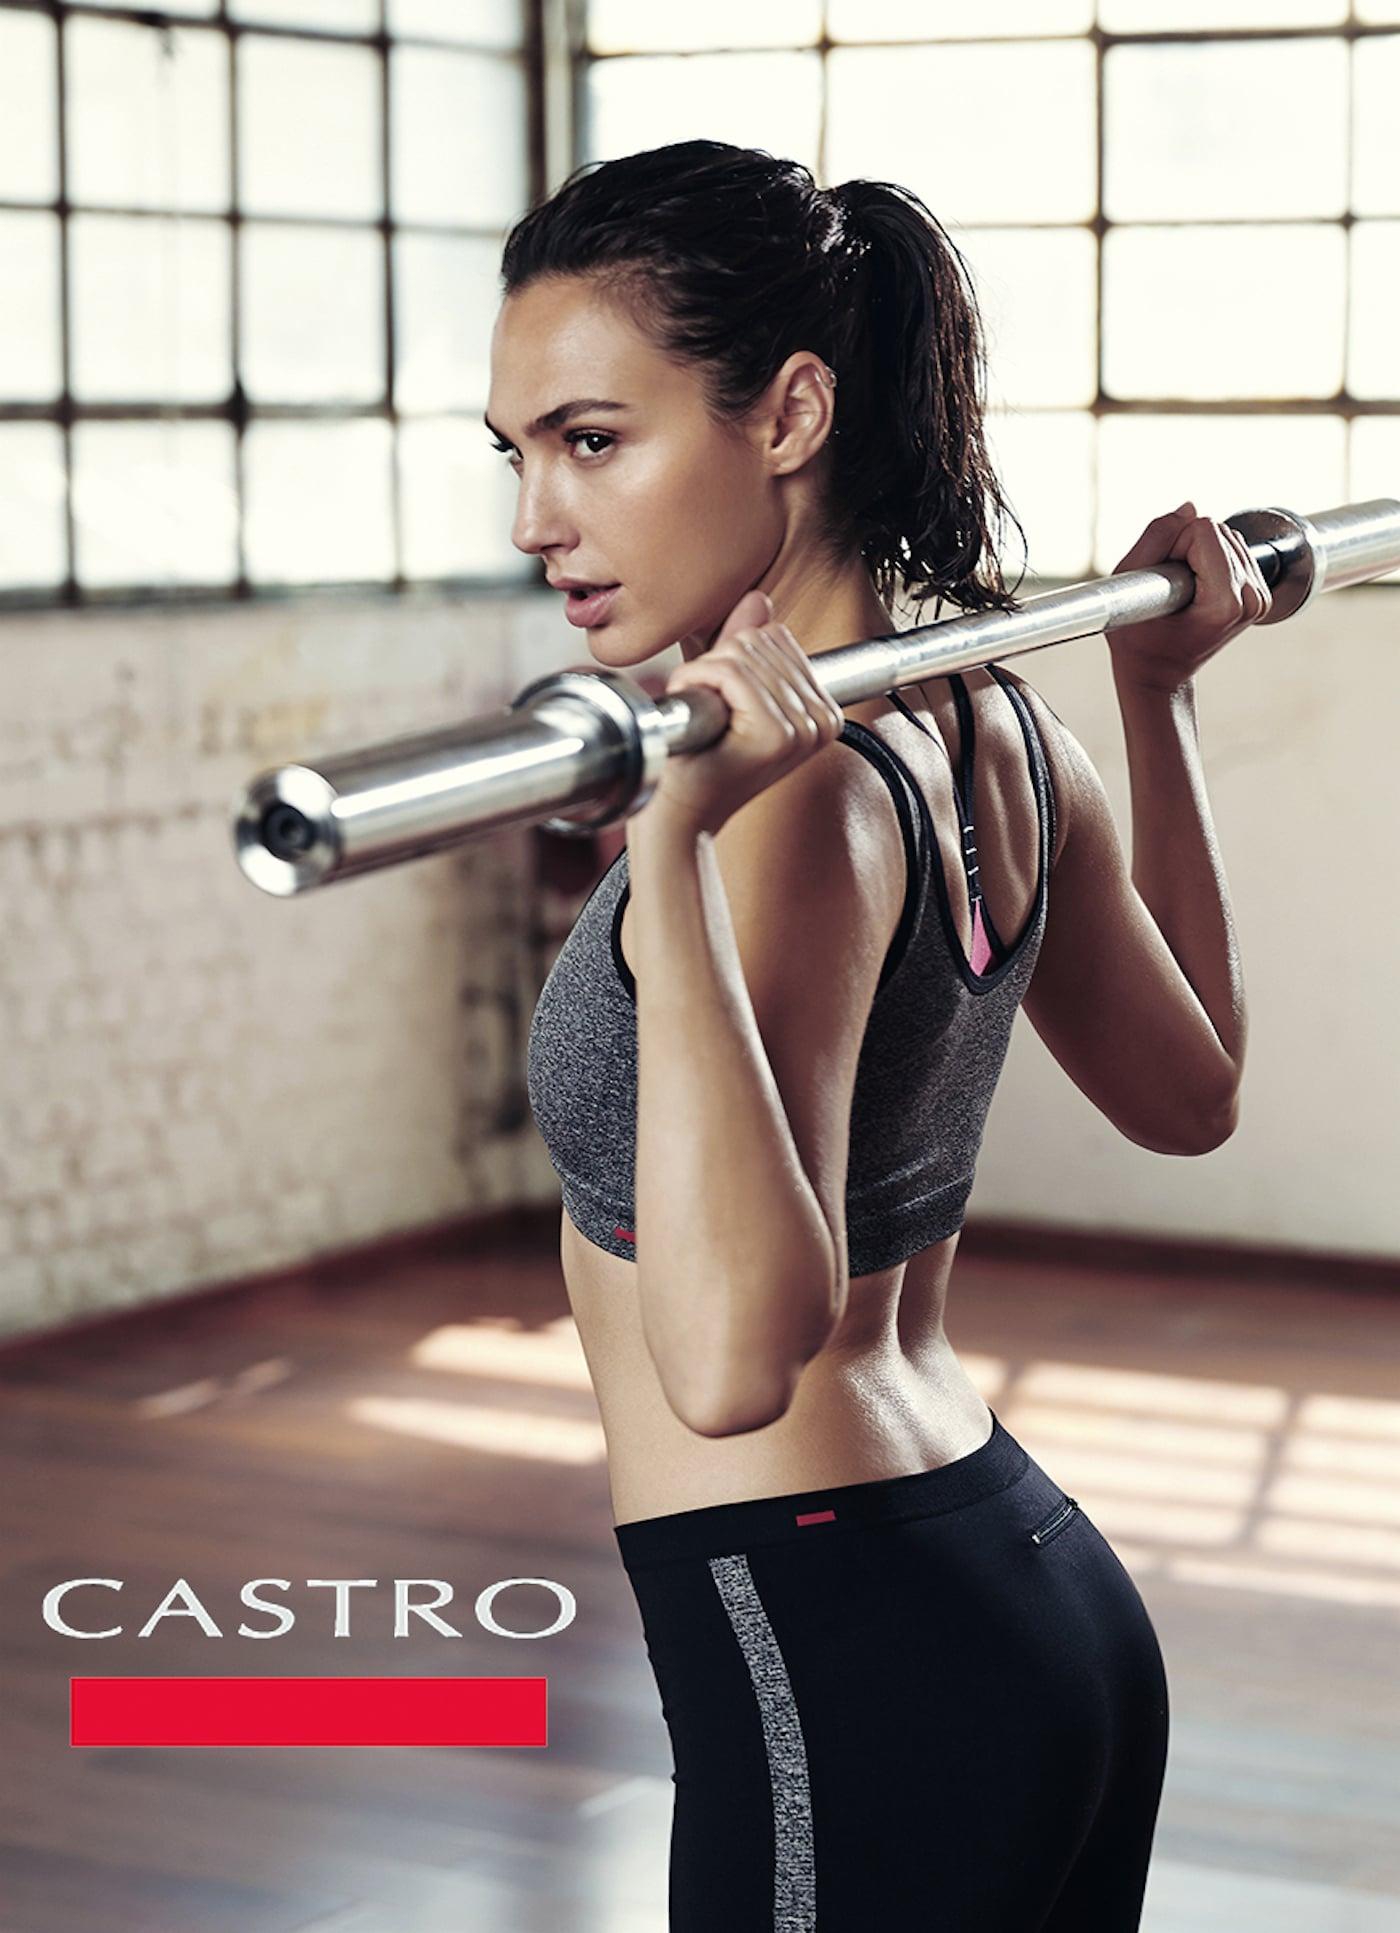 Castro Sports15213 1Layers copy.jpg